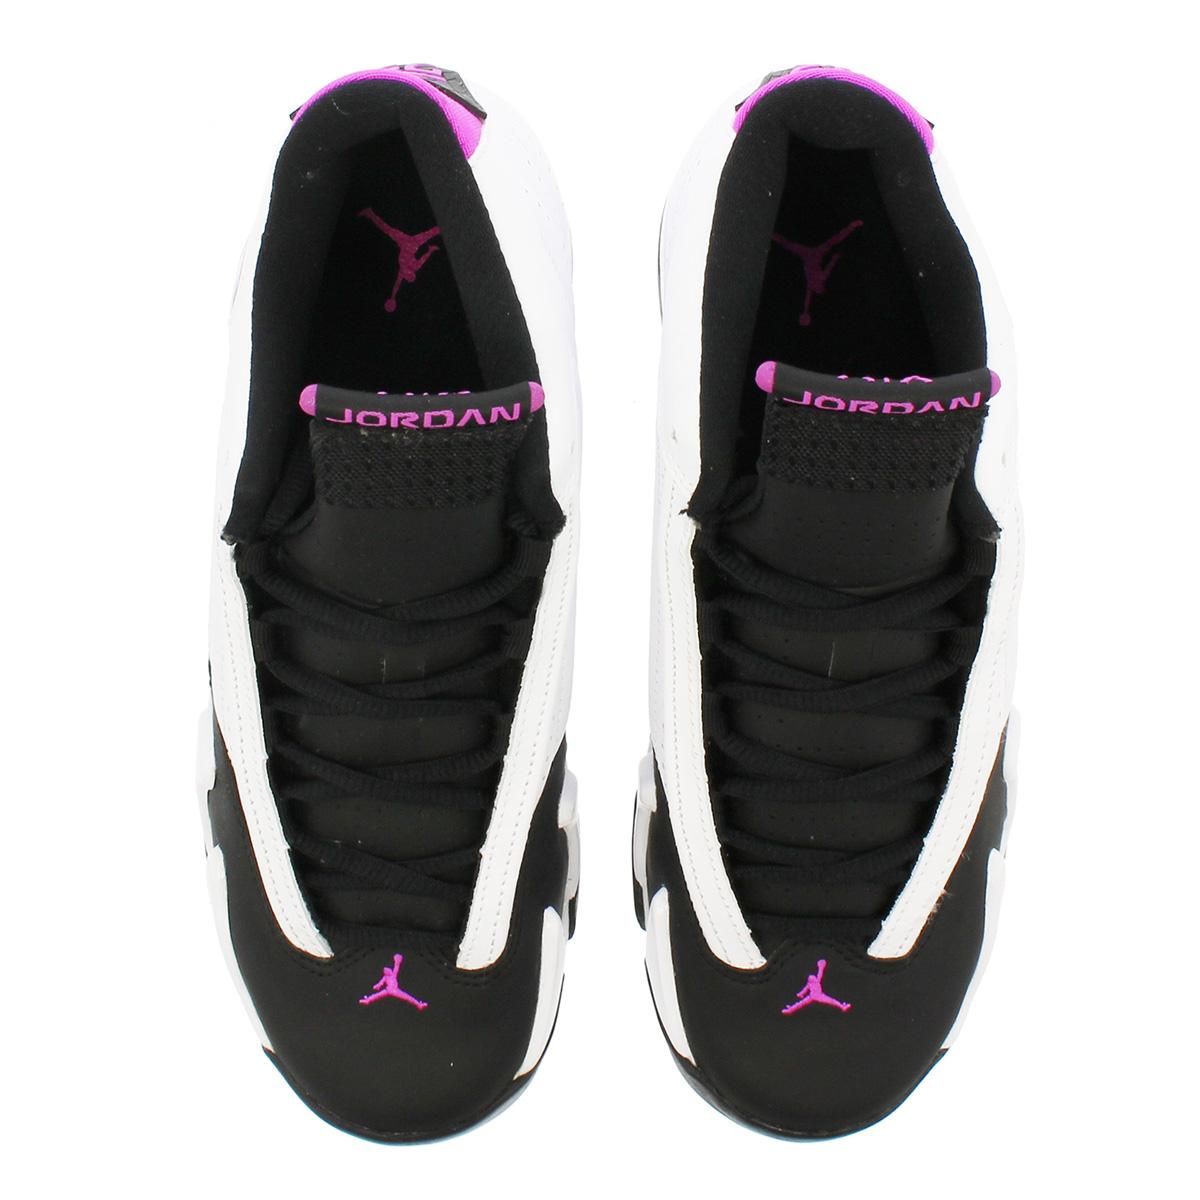 the latest 4f948 6a221 NIKE AIR JORDAN 14 RETRO GS Nike Air Jordan 14 nostalgic GS WHITE/FUCHSIA  FLASH/BLACK 654,969-119